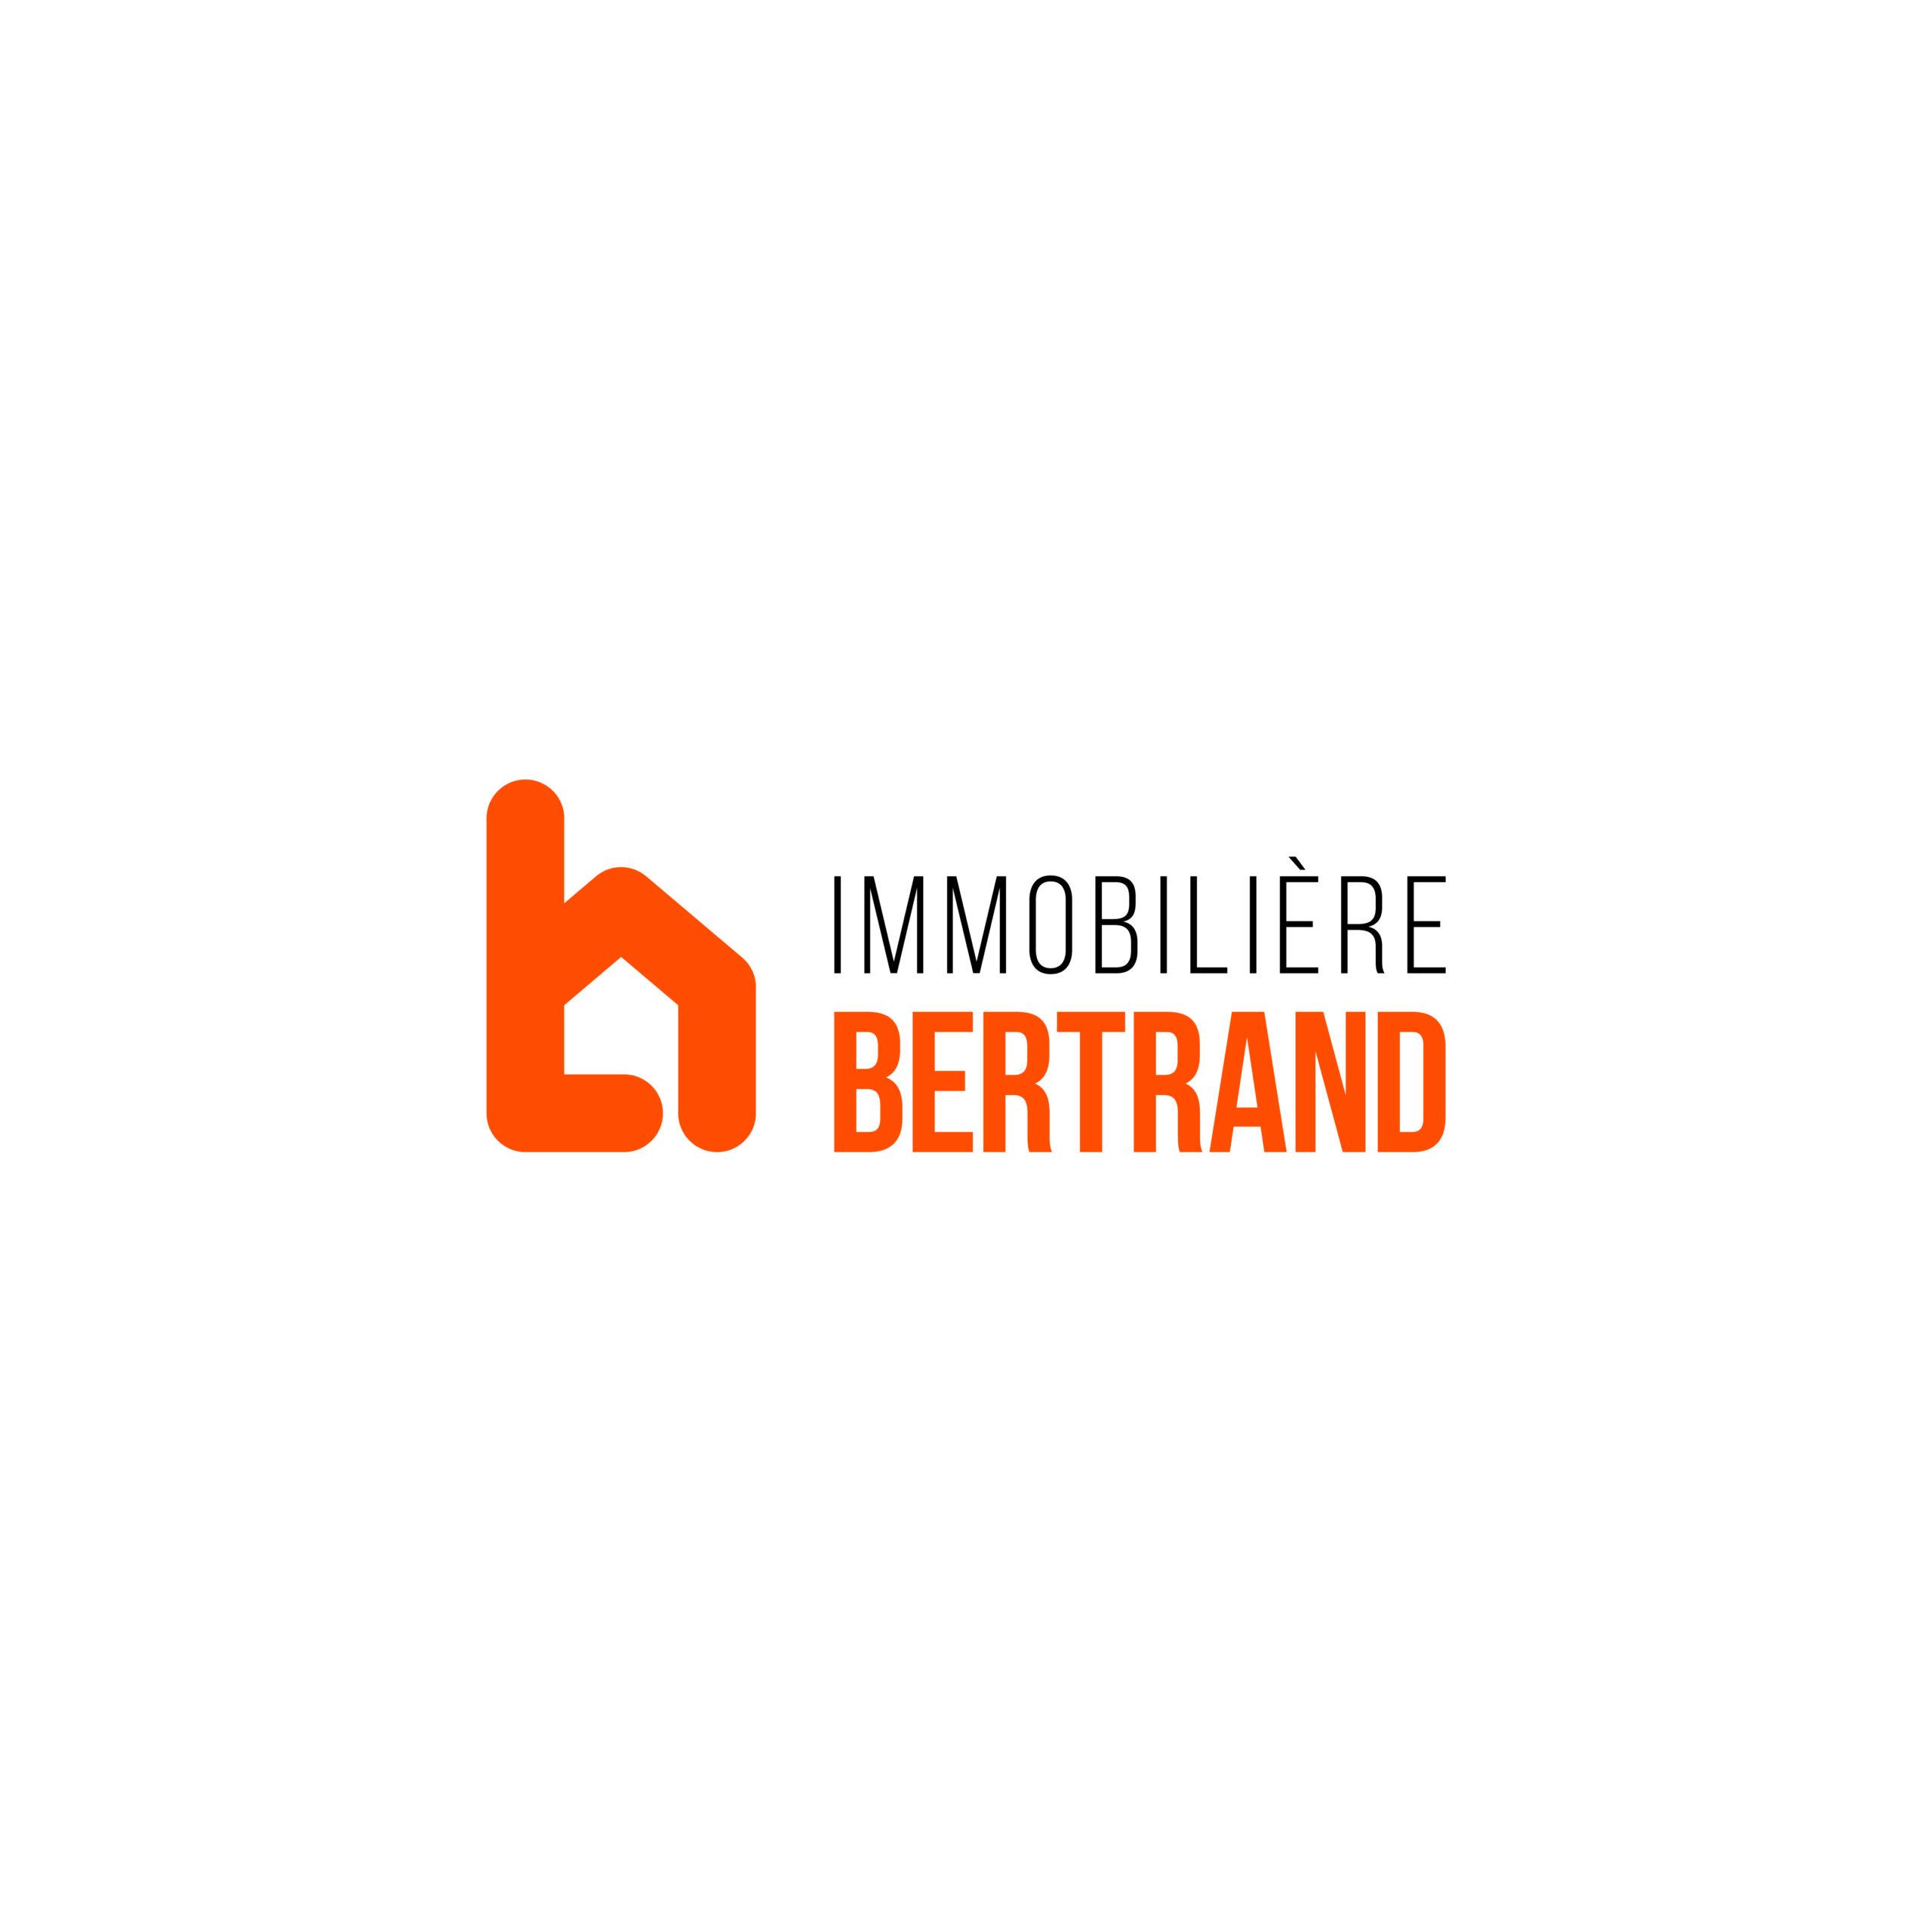 Immobilière Bertrand